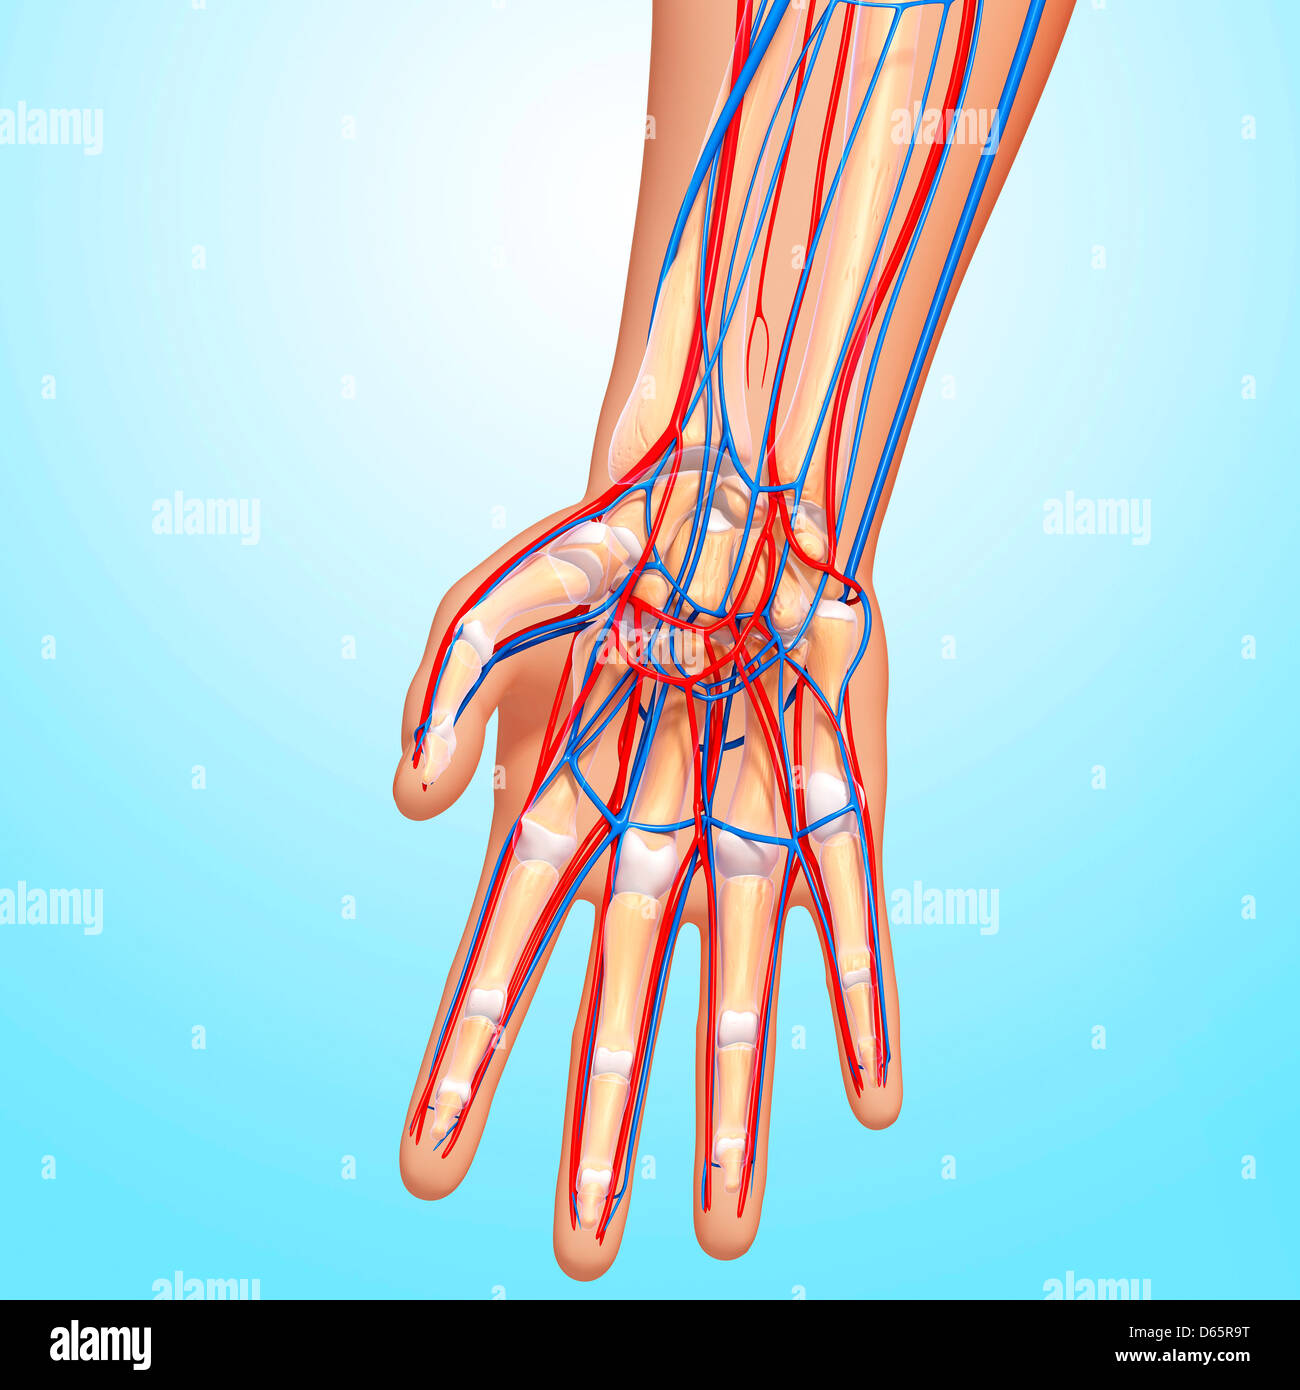 Skeleton Hand Stockfotos & Skeleton Hand Bilder - Alamy